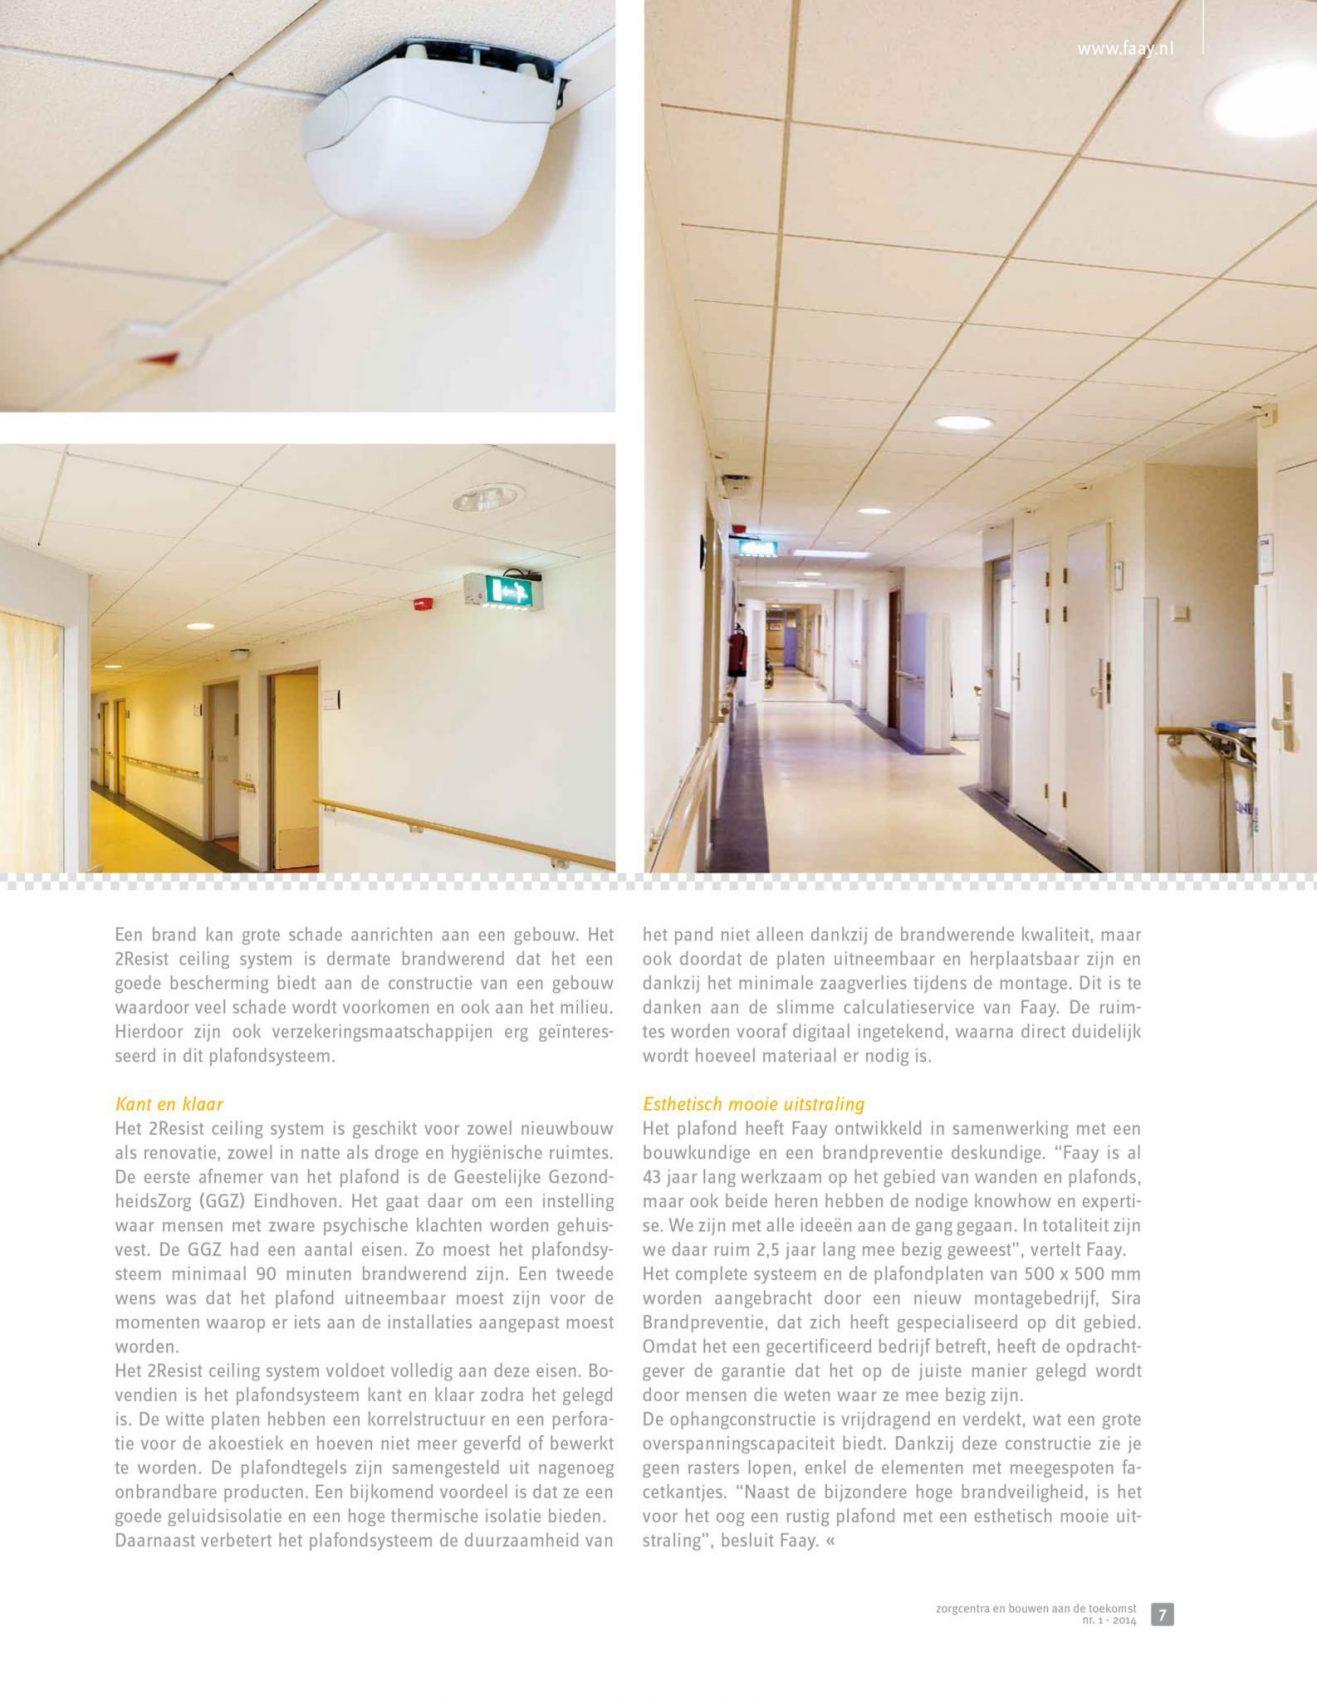 Faay Wanden en Plafonds - Zorgcentra - 2resist